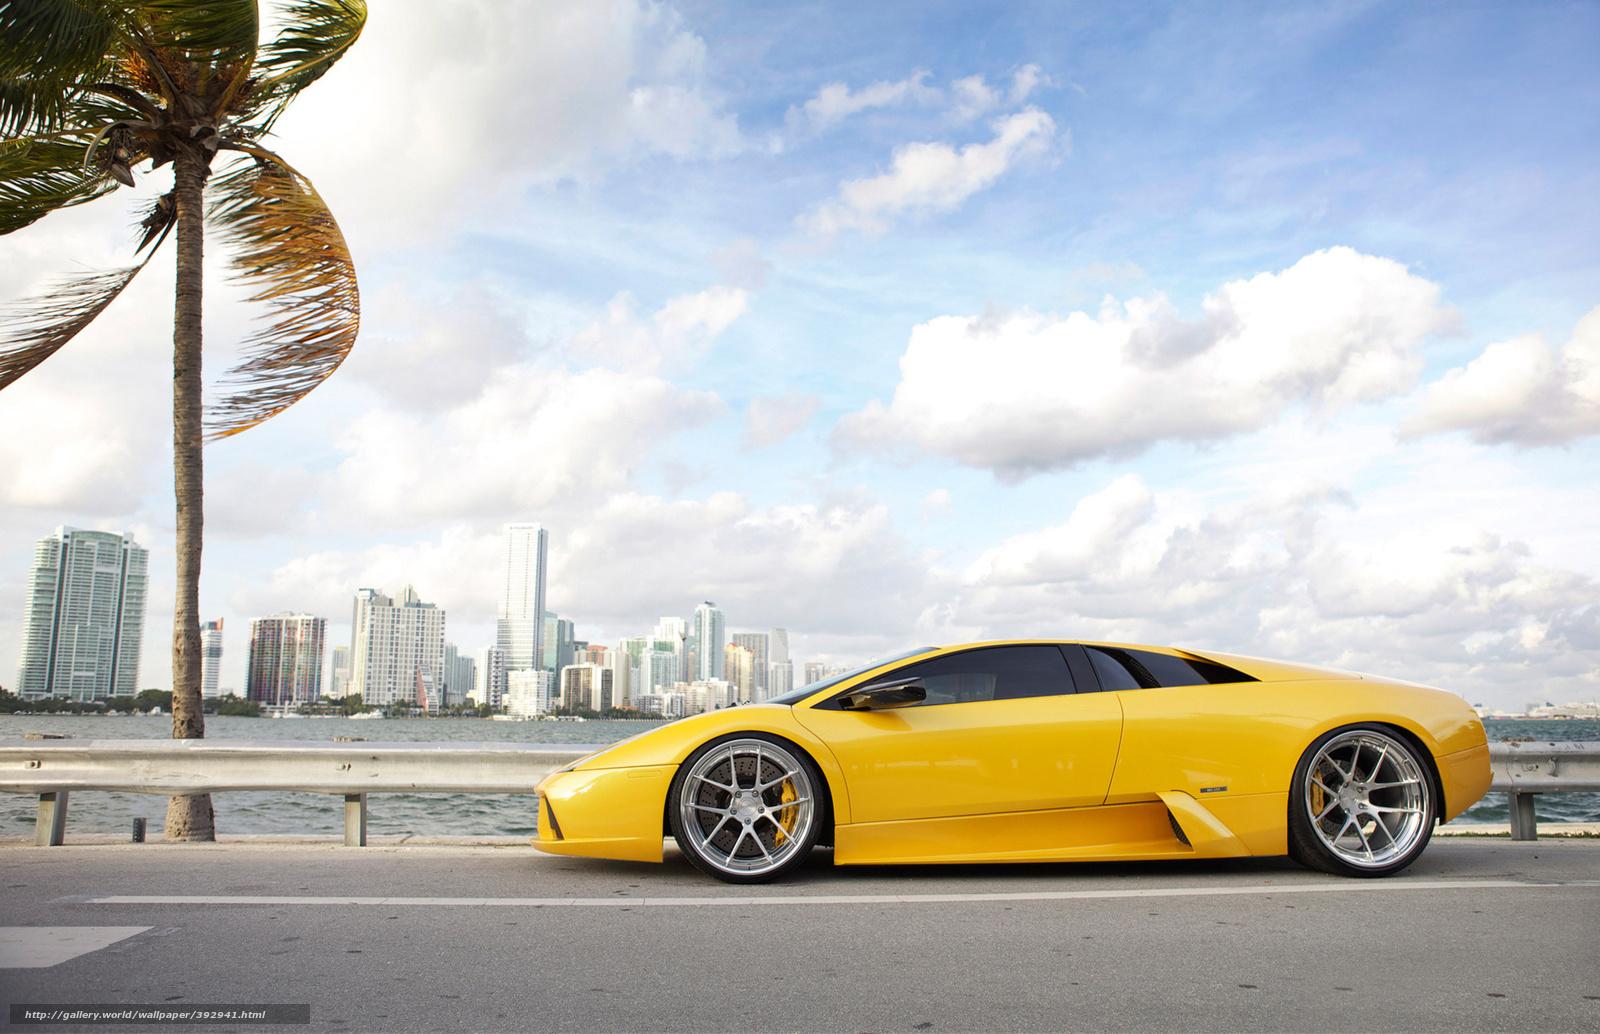 Download Wallpaper Lamborghi Miami Yellow Pylmy Free Desktop Wallpaper In The Resolution